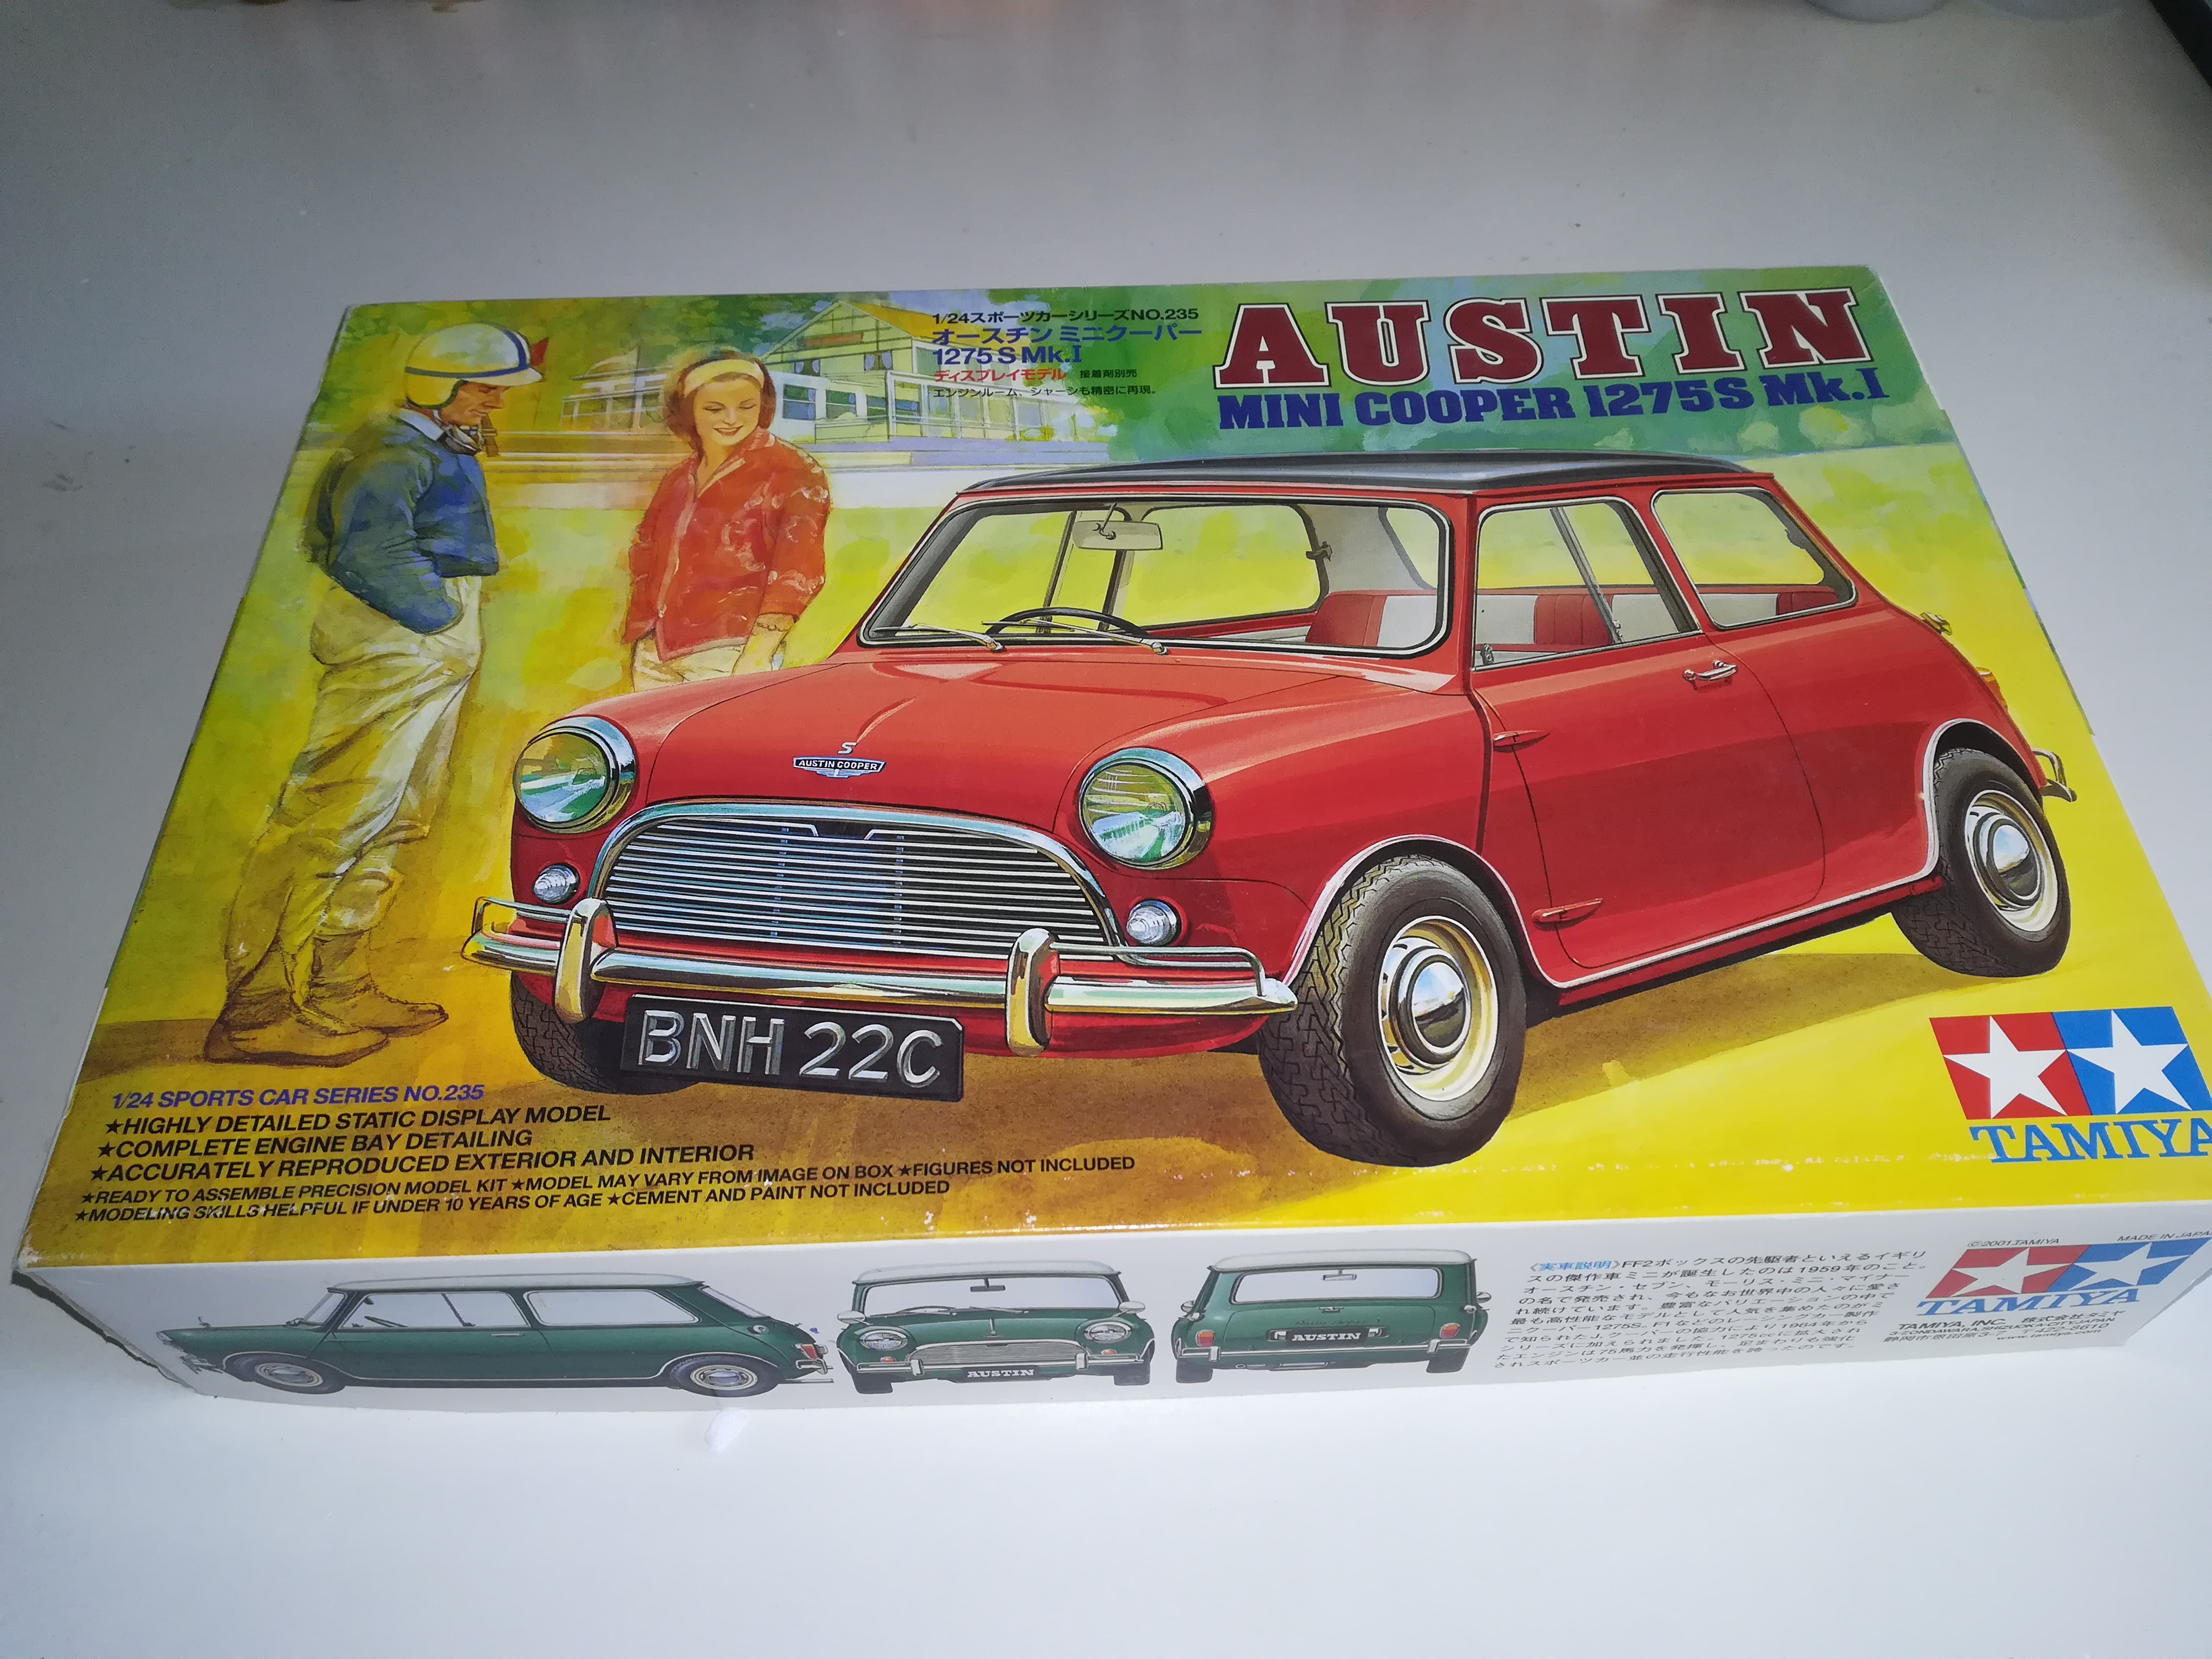 Building A Tamiya 124 Austin Mini Cooper On The Workbench Model